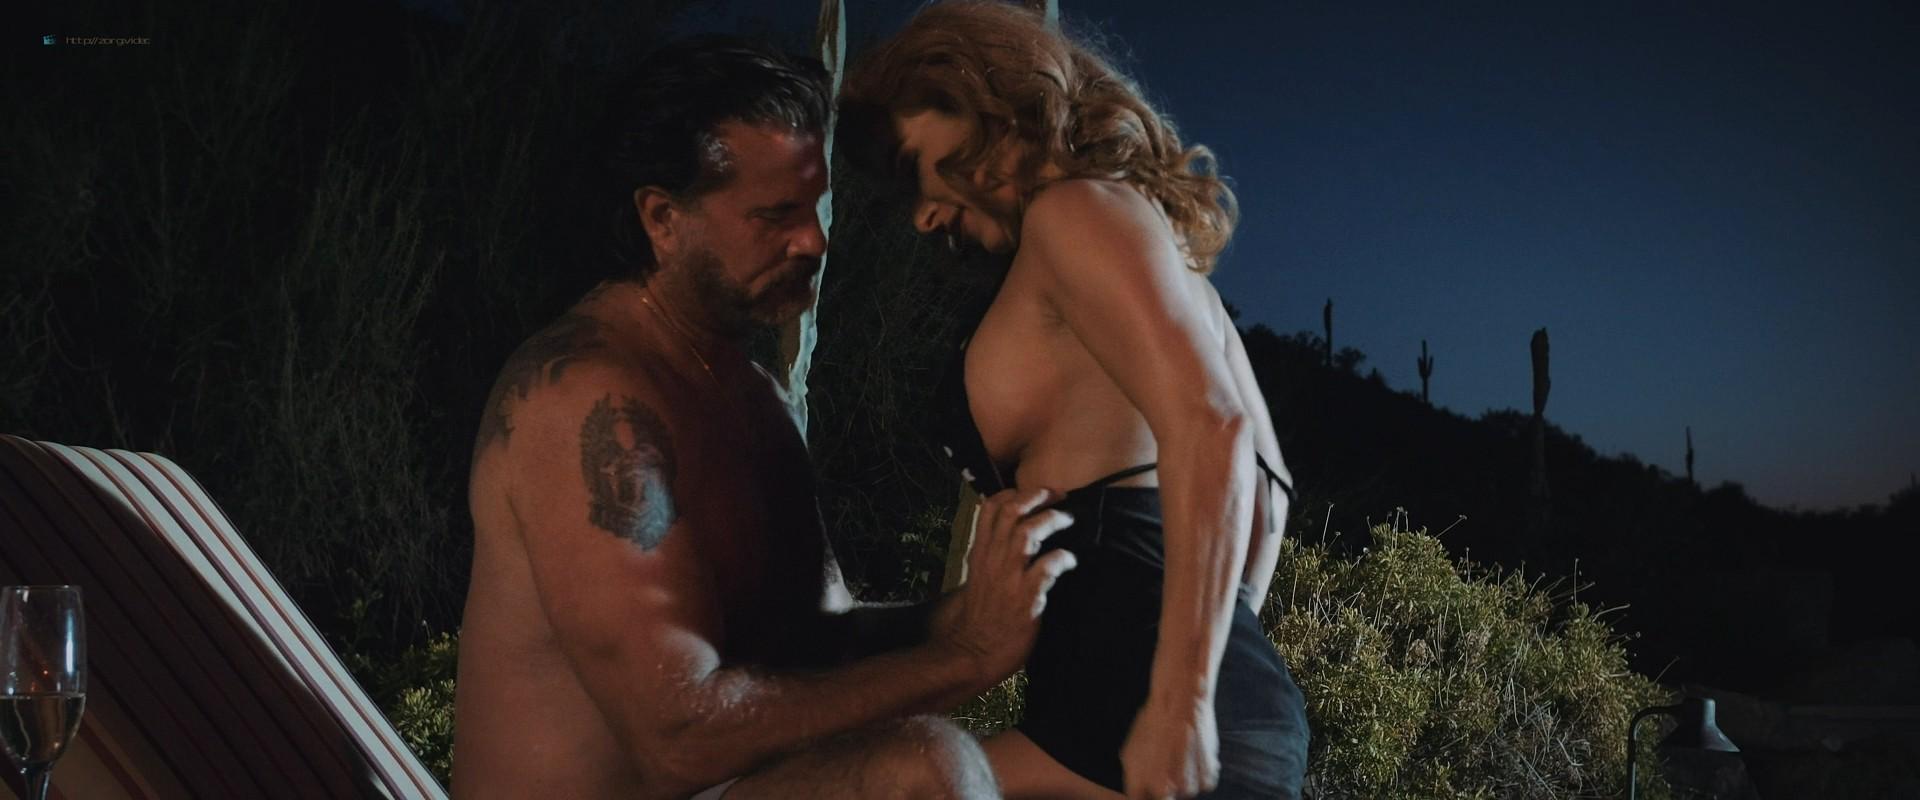 Audrey Beth nude topless Kier Simonetta, Michelle Miller nude too - Water (2019) 1080p (11)